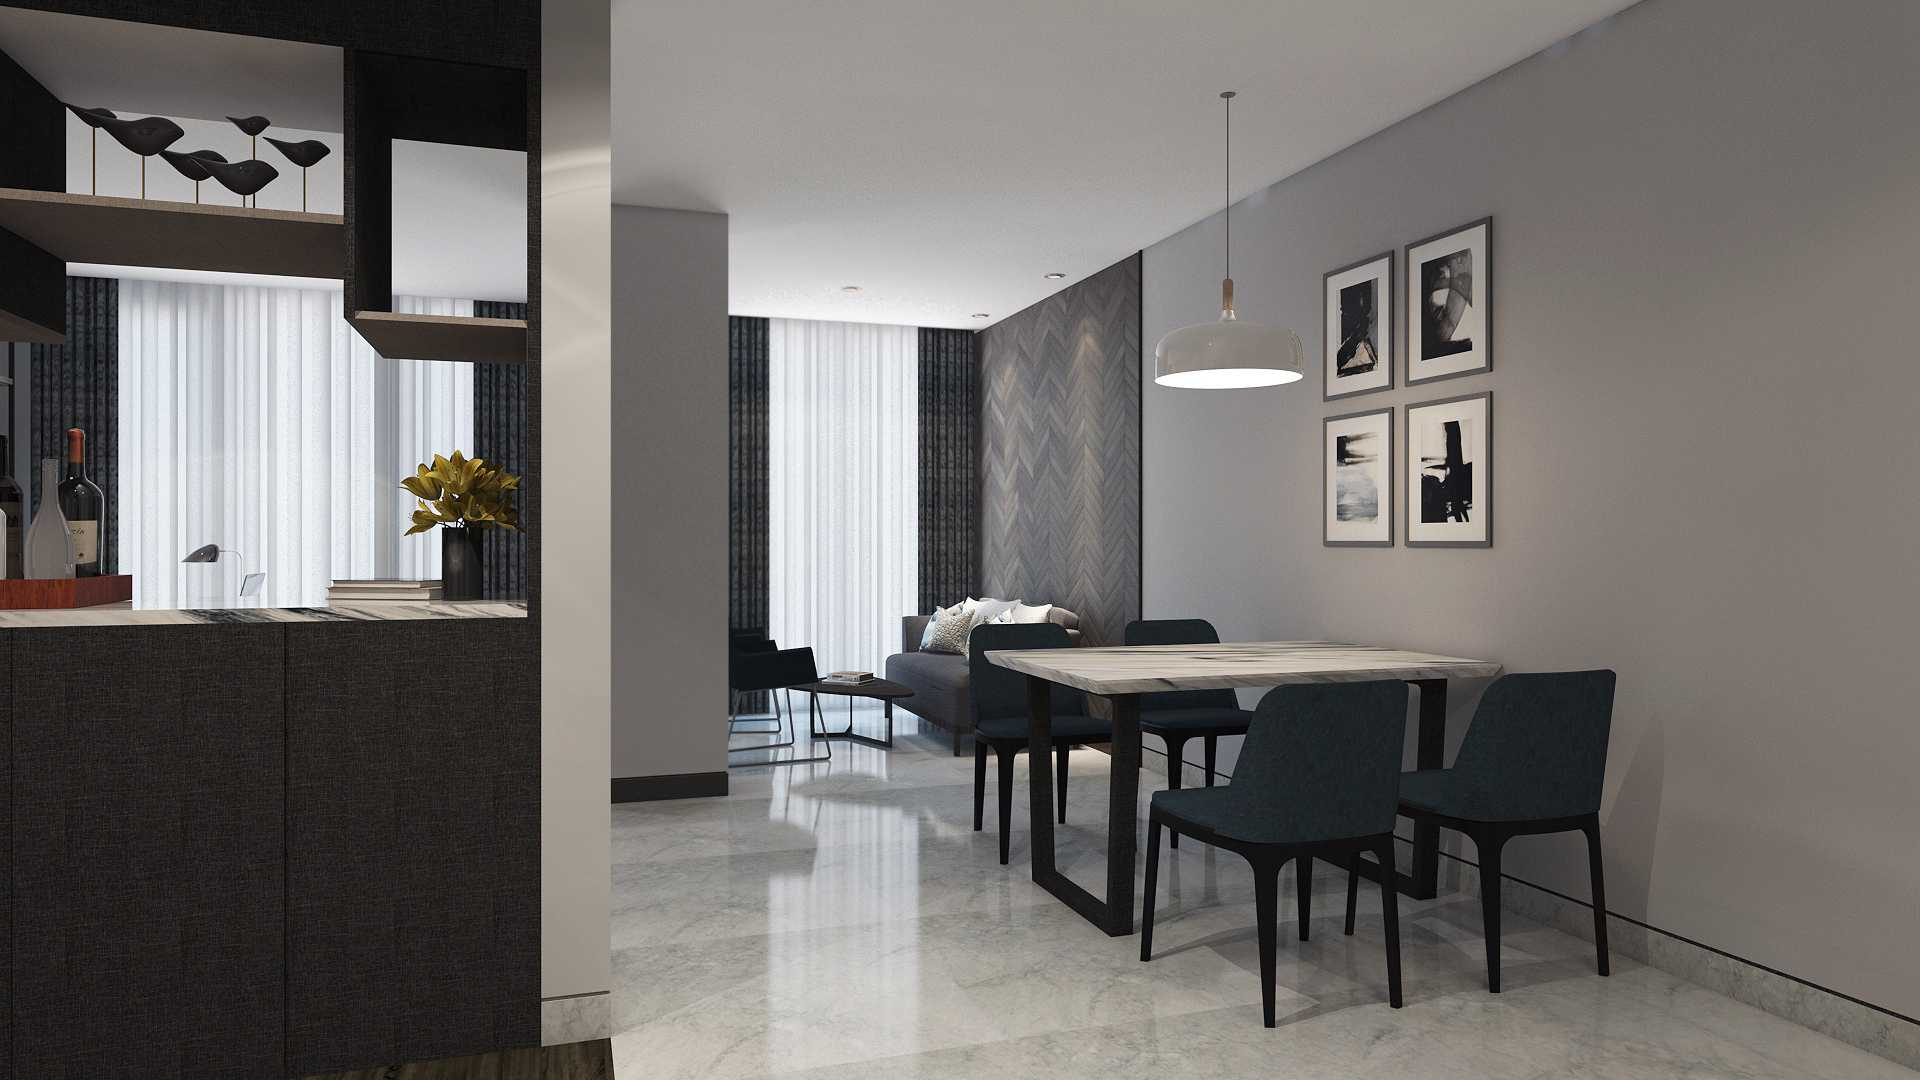 Oka Leonardy Interior Design Concept : Apartemen 2 Br - Jakarta Cikarang, Bekasi, Jawa Barat, Indonesia Cikarang, Bekasi, Jawa Barat, Indonesia Oka-Leonardy-Interior-Design-Concept-Apartemen-2-Br-Jakarta   110537